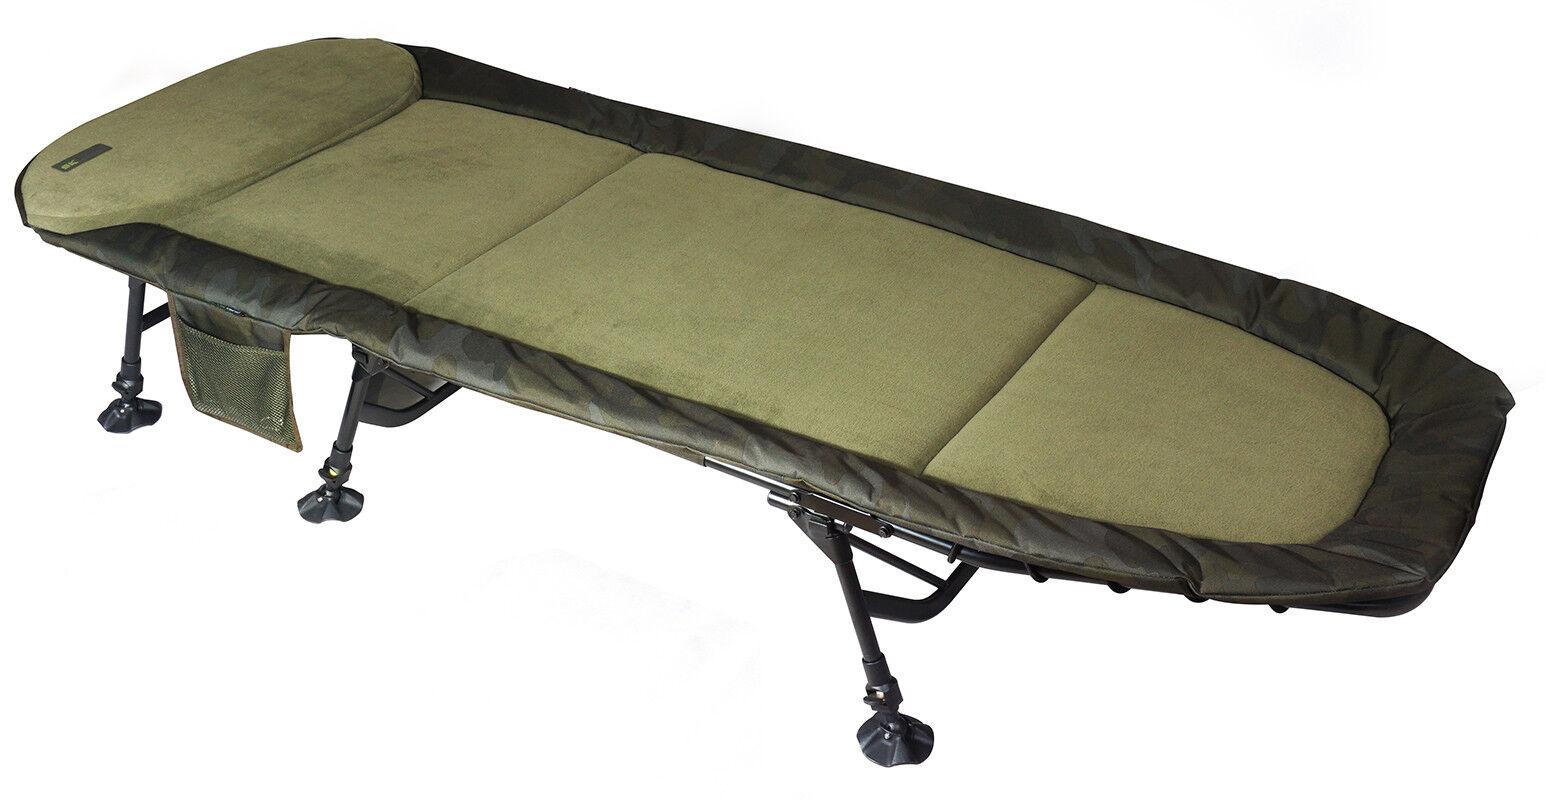 Sonik SK-Tek Wide Wide SK-Tek Levelbed NEW Carp Fishing Bedchair Level Bed - SKTCH070 4ae649